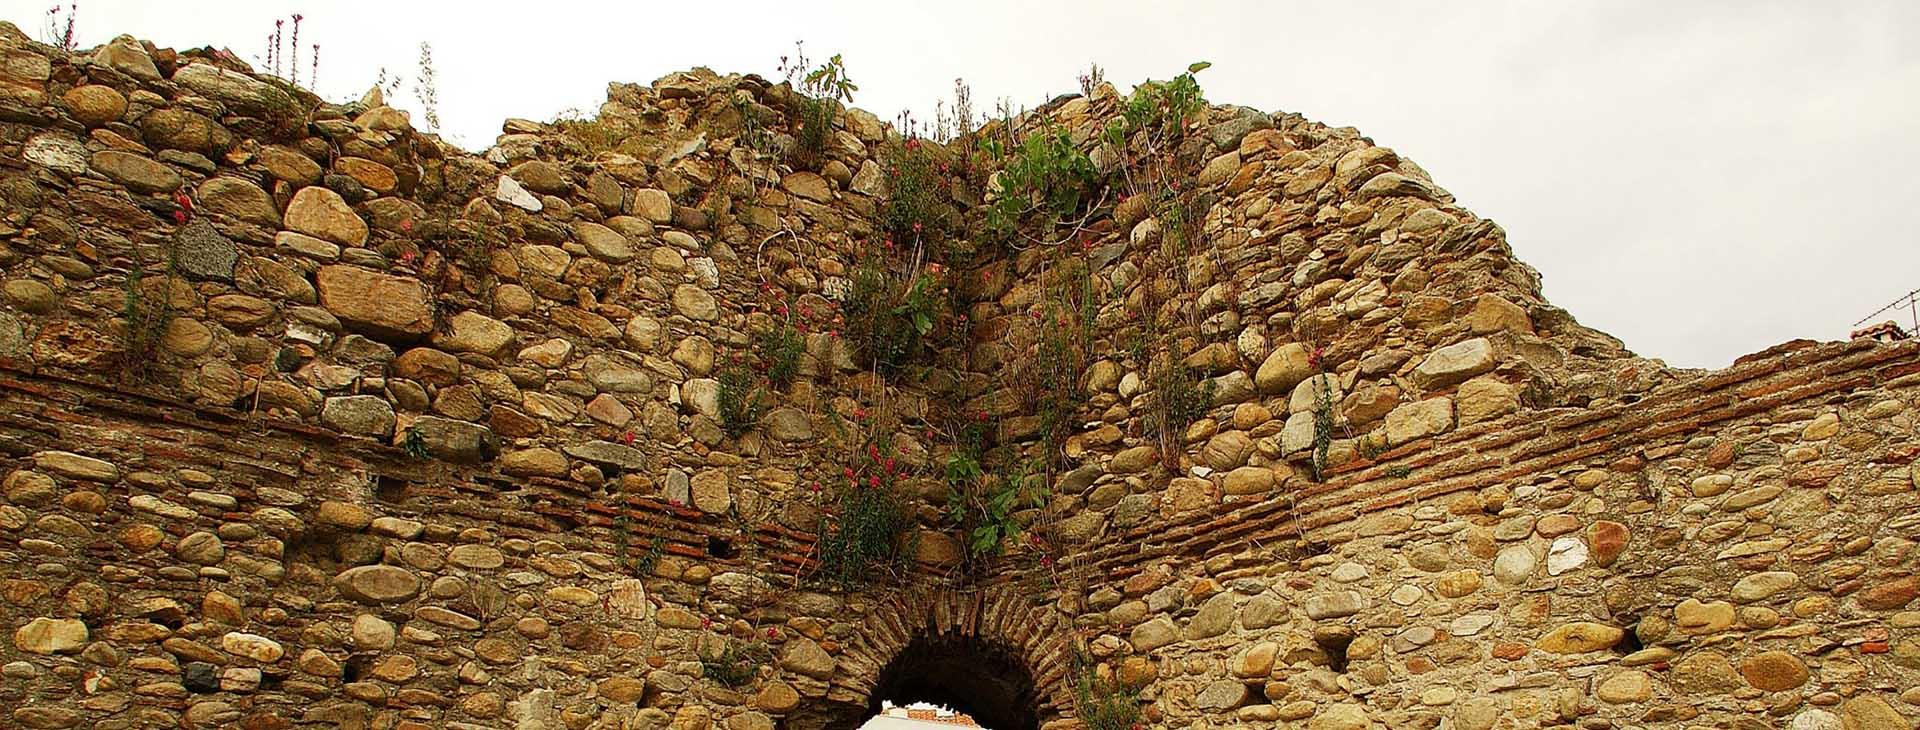 Vyzantine fortress, Komotini, Rodopi